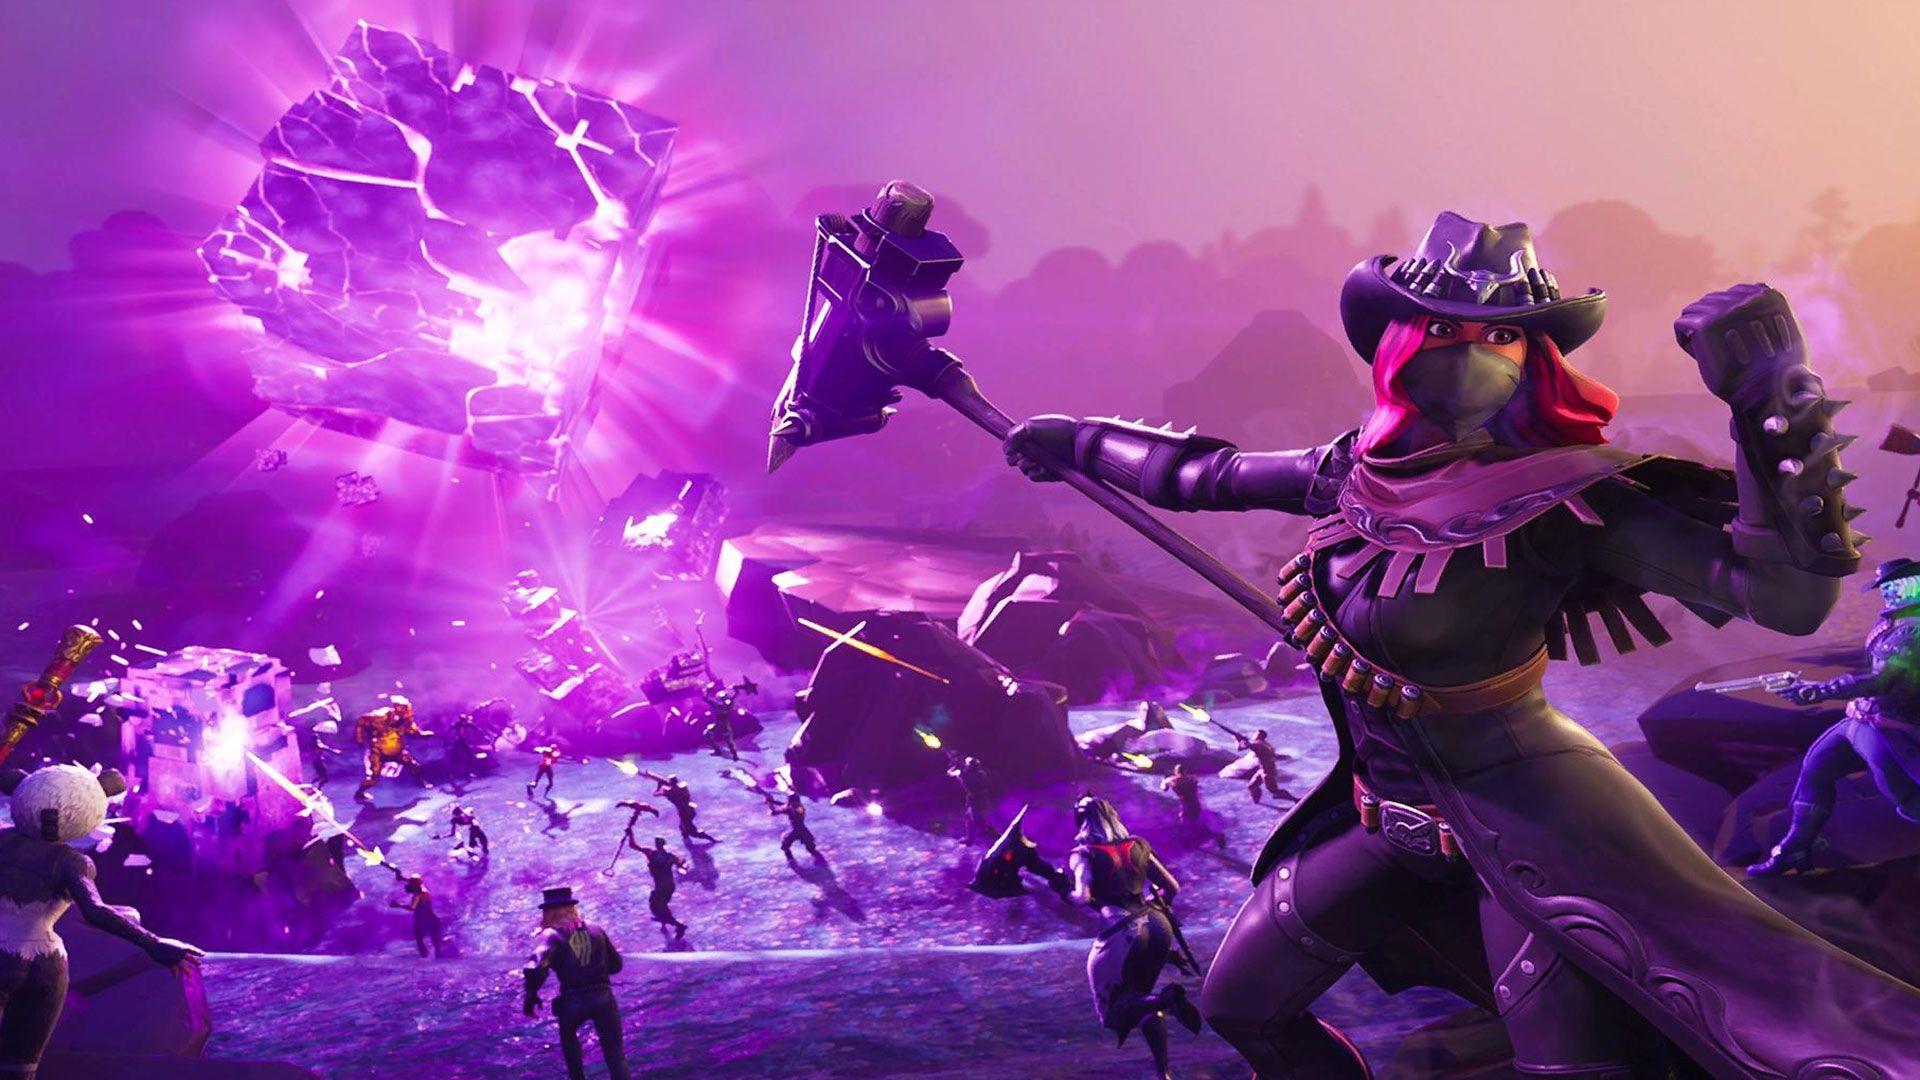 Fortnite Desktop Wallpapers Hd Em 2020 The Hunting Party Fortnite Papeis De Parede De Jogos